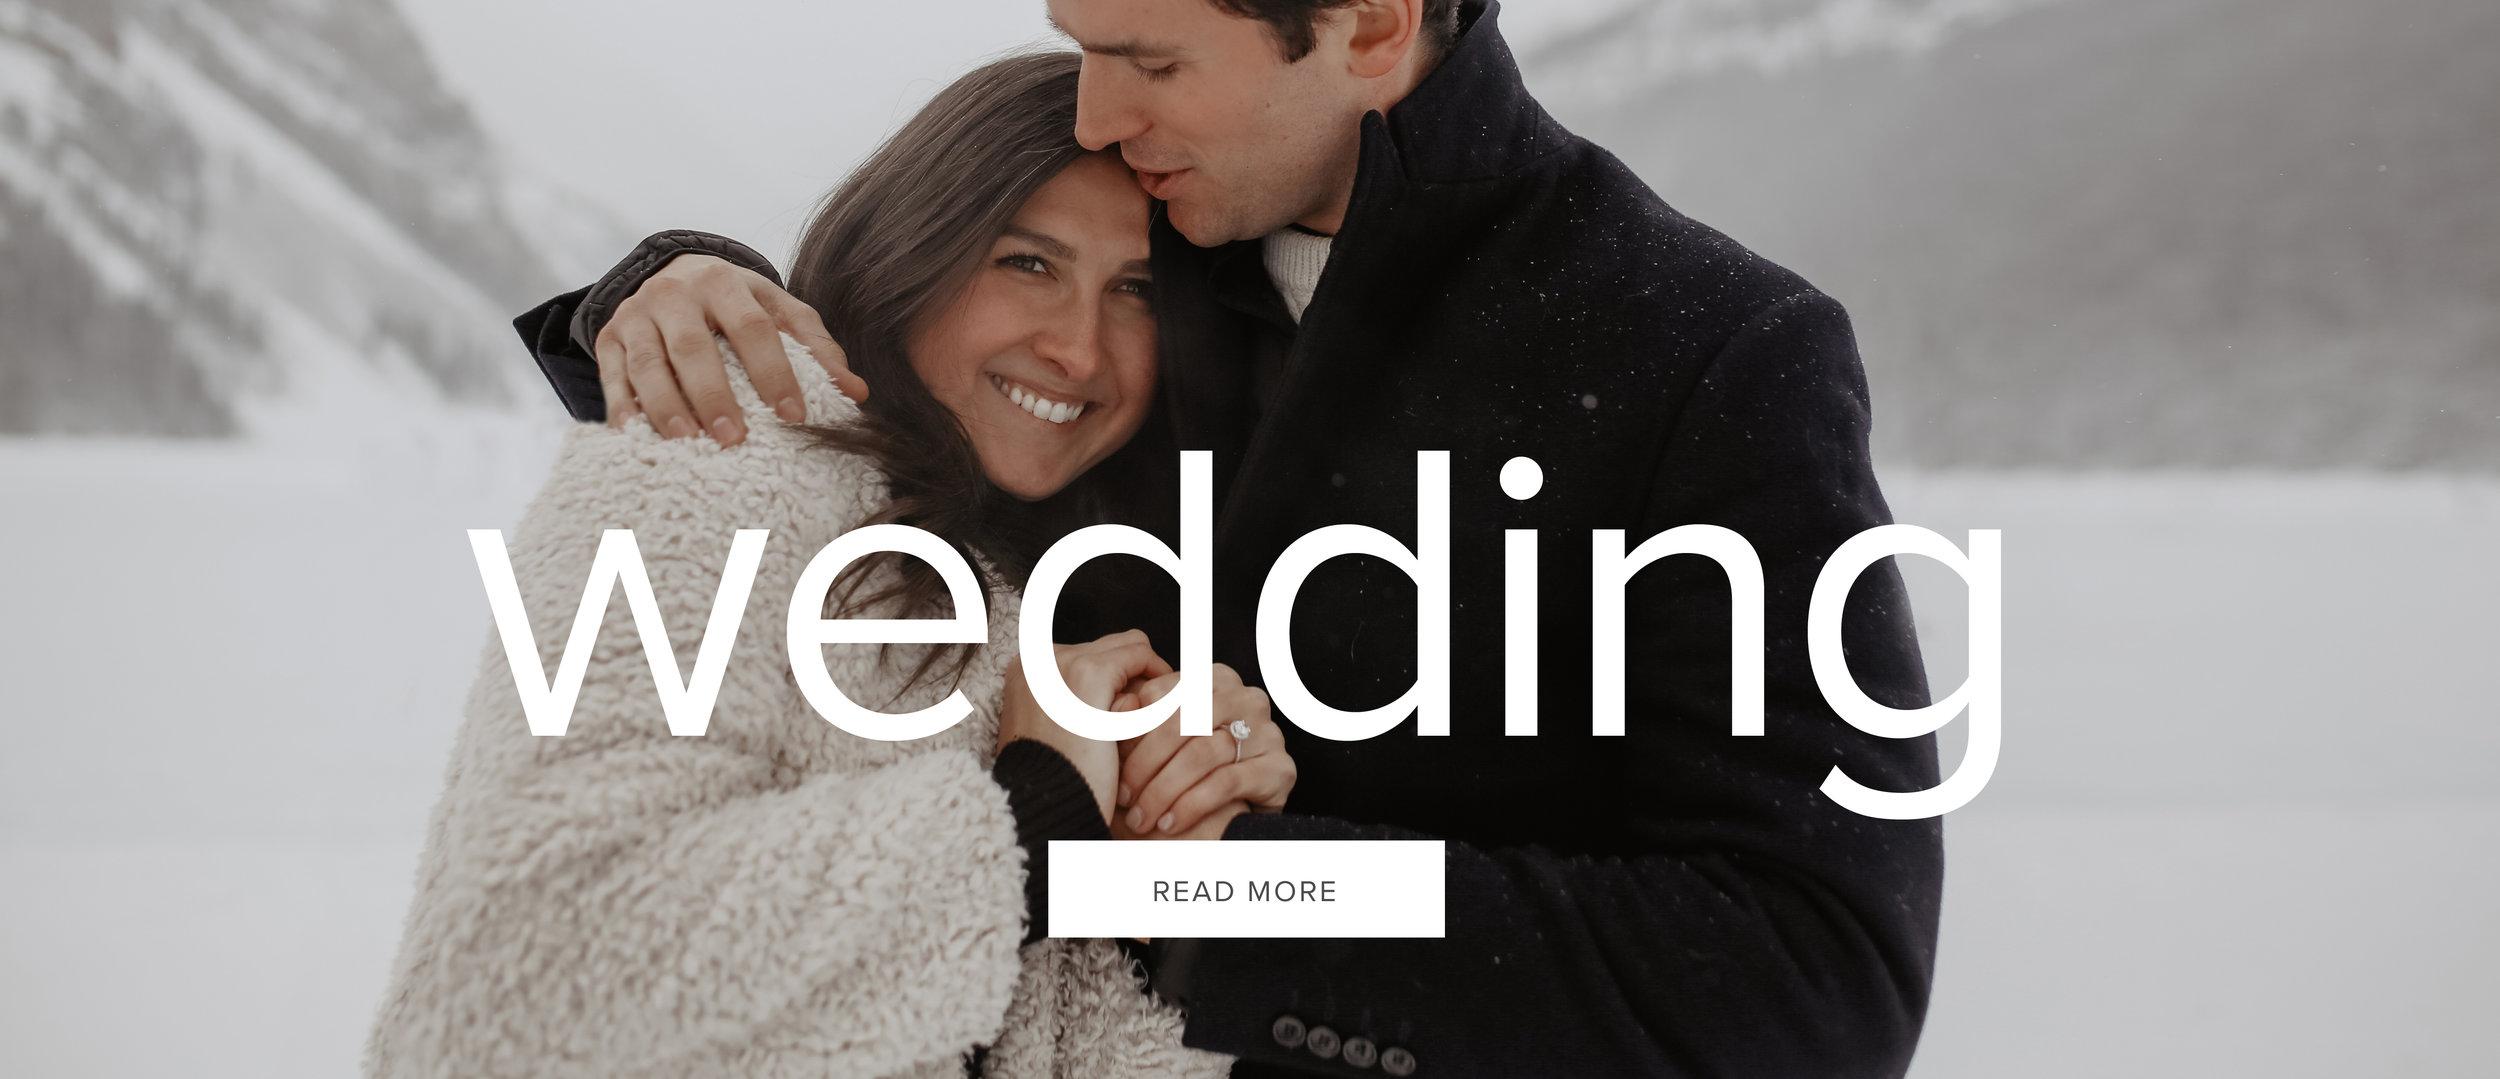 laurennicolefoot-blog-wedding-featurepanel-.jpg